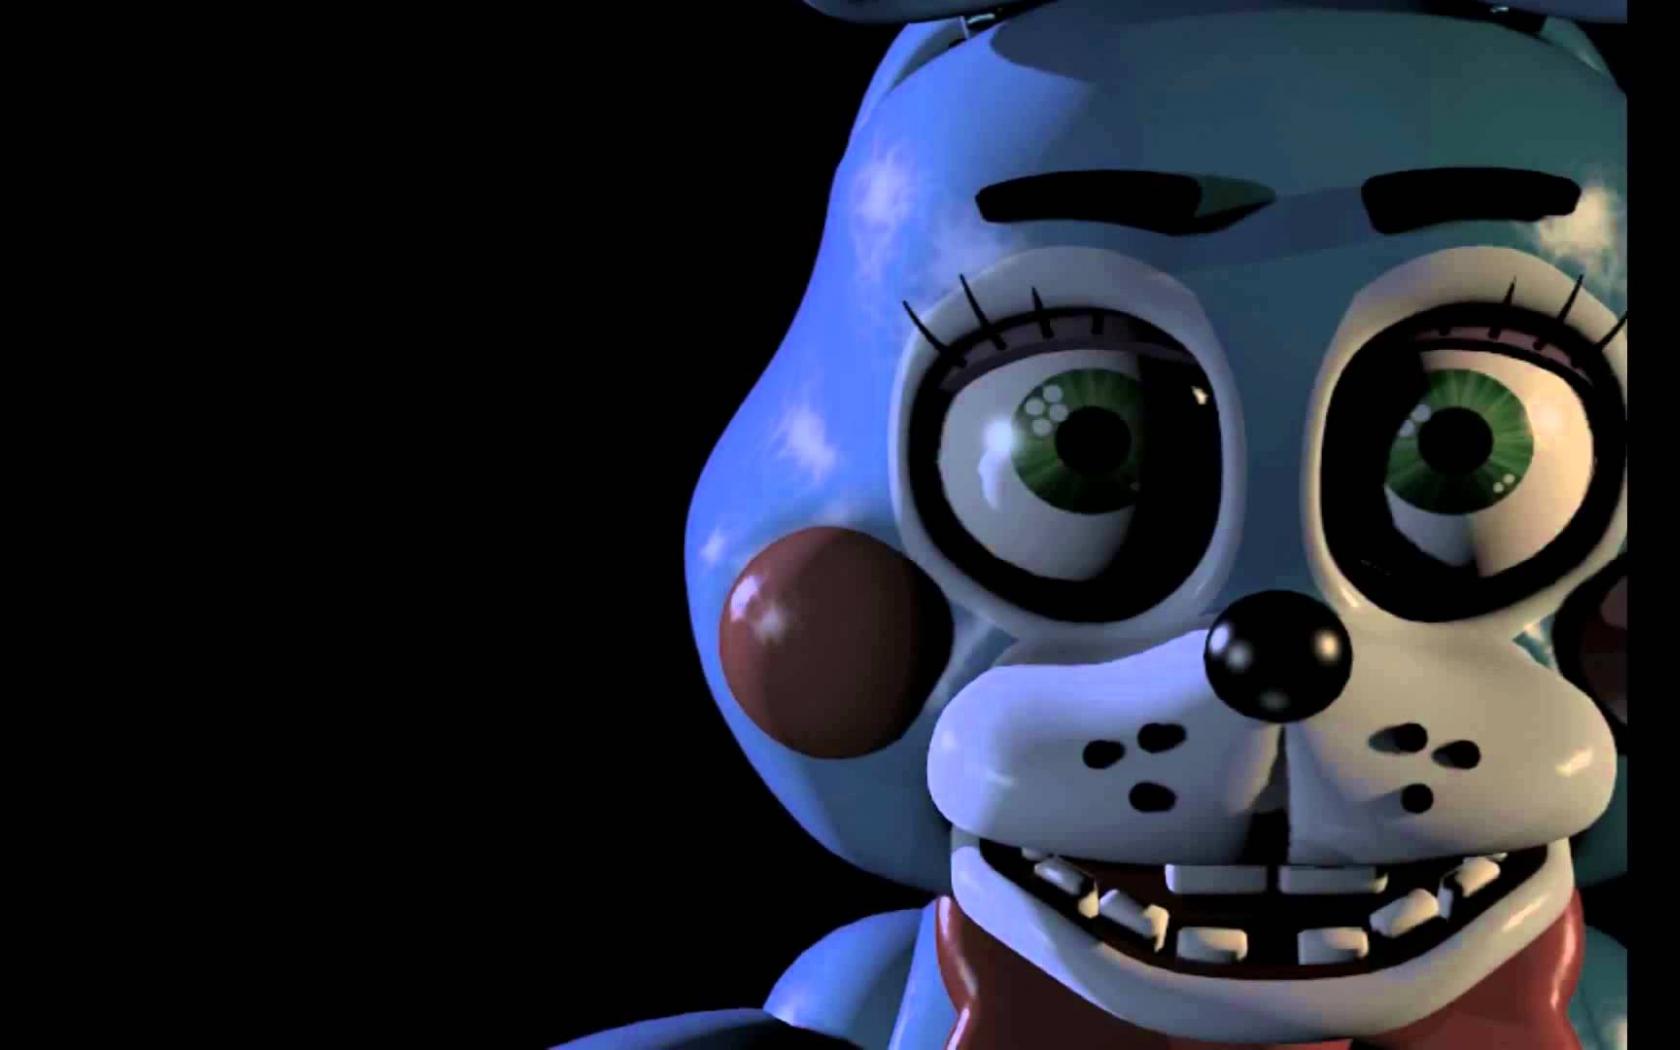 Free Download Five Nights At Freddys 2 Online Games Tus Juegos